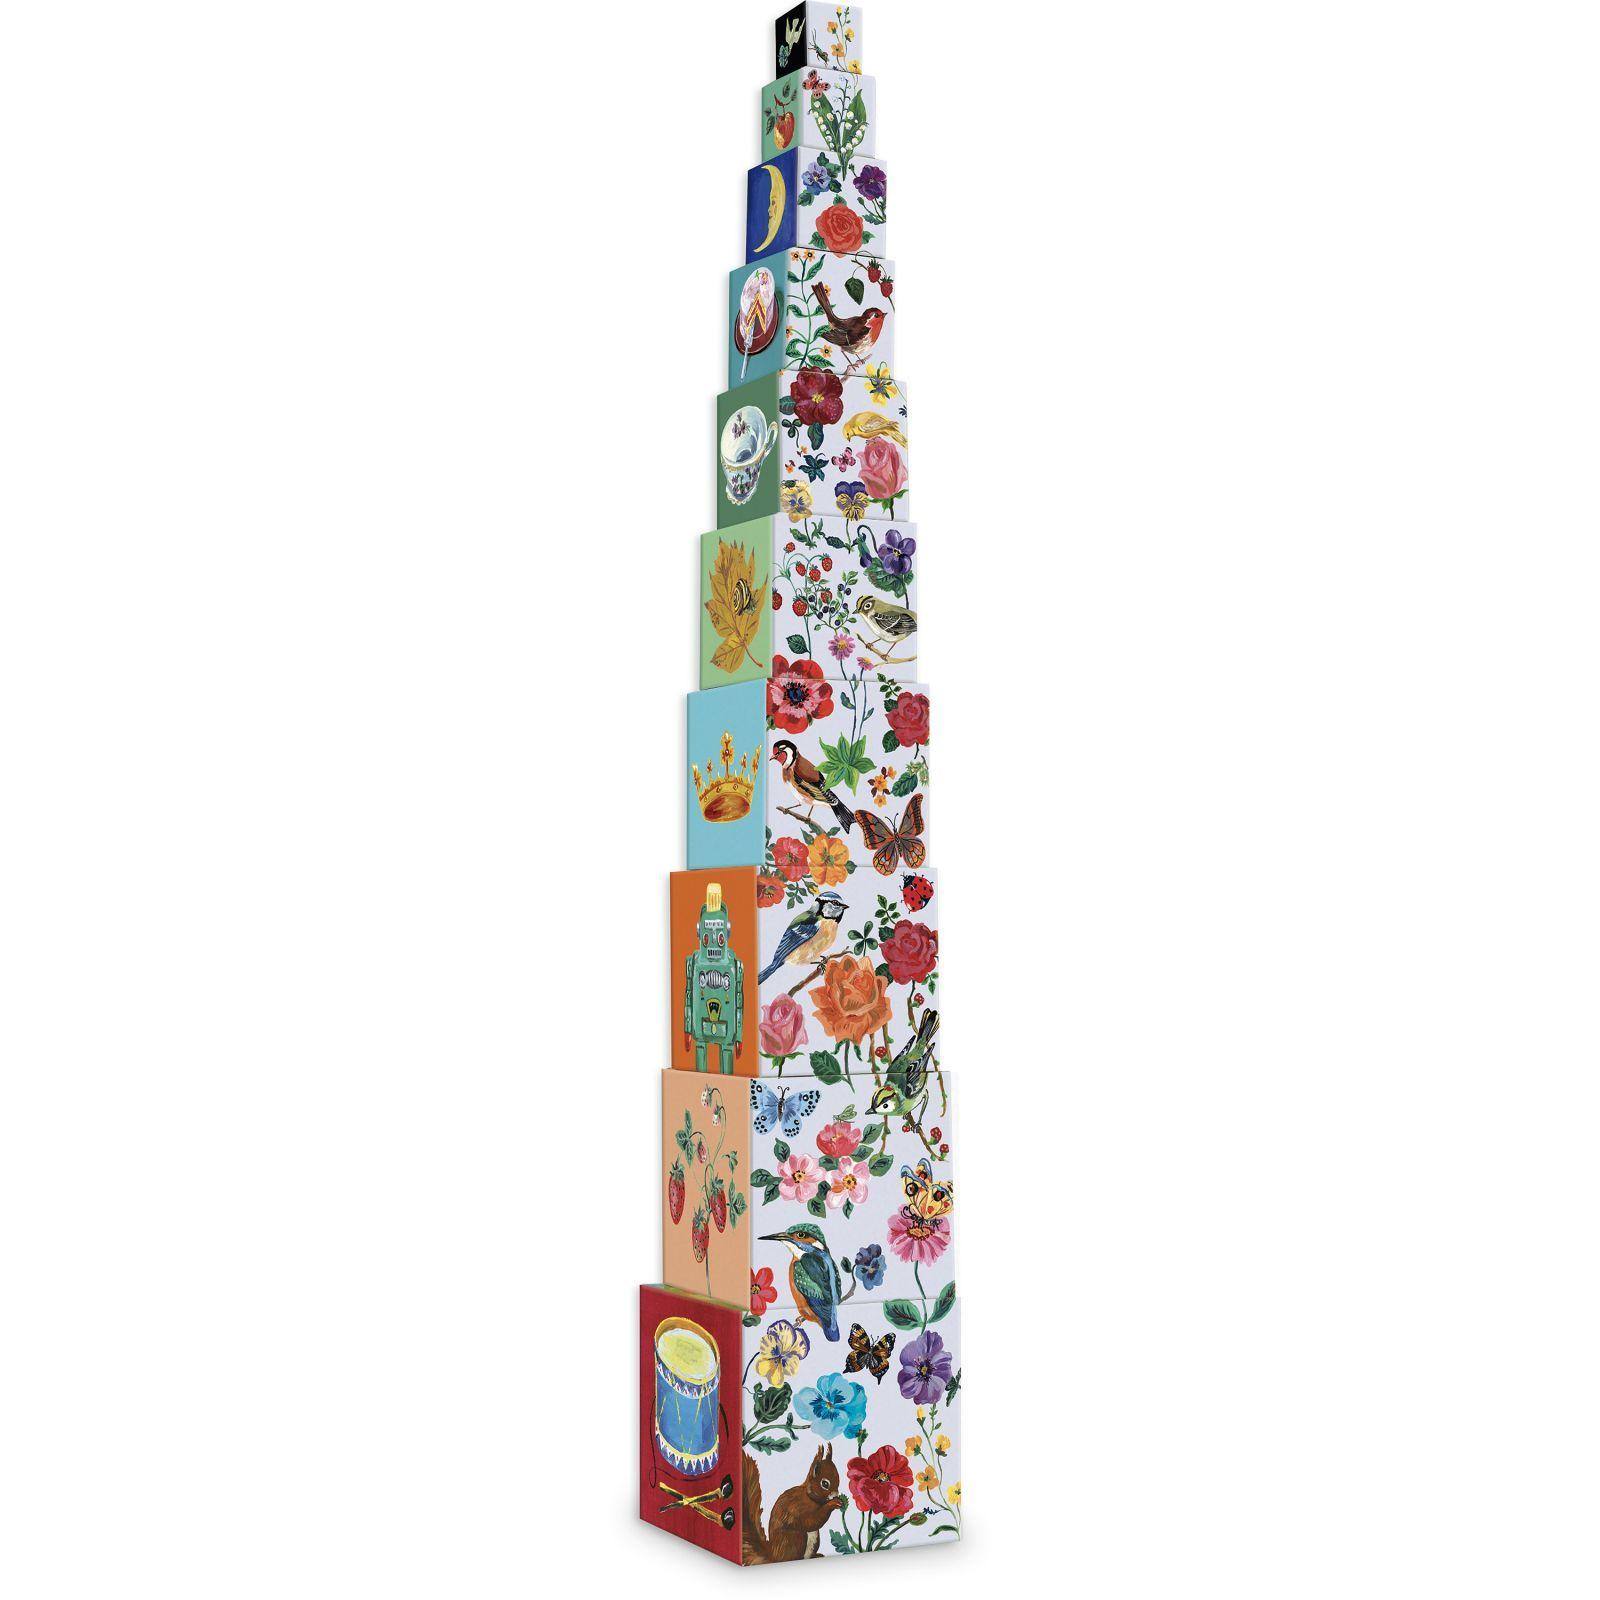 Dřevěné hračky Vilac Skládací kostky Nathalie